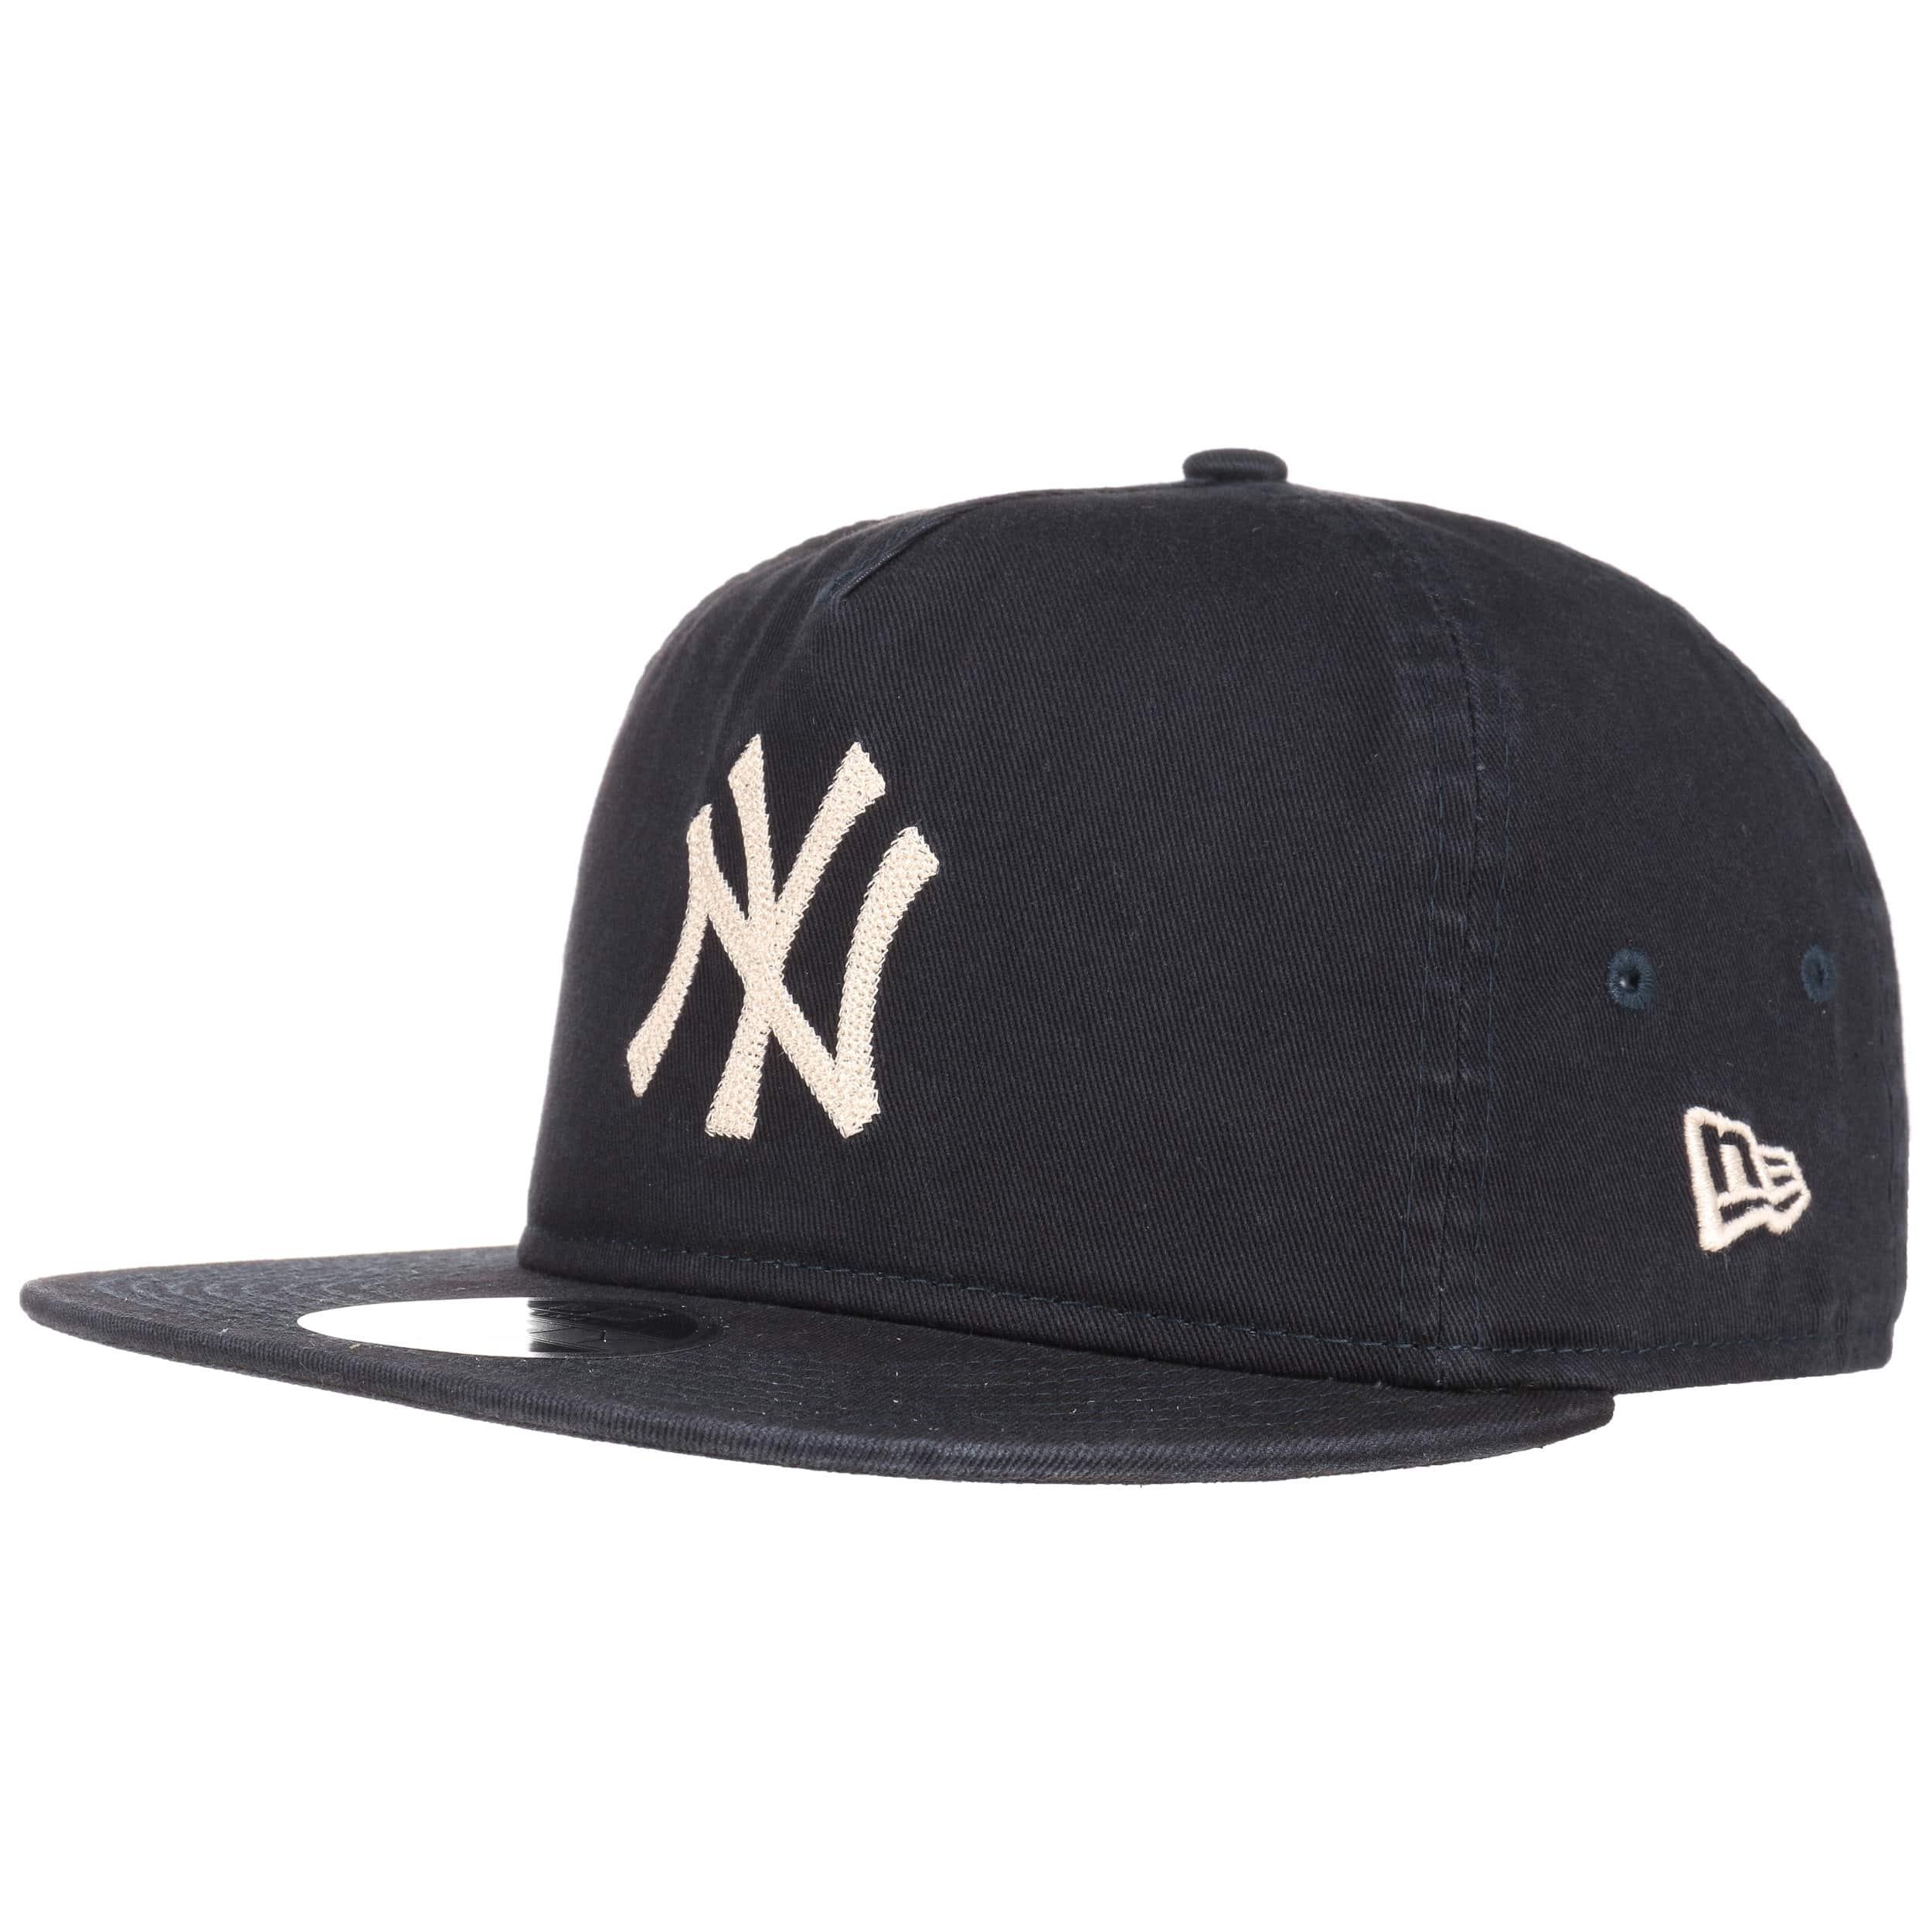 NEW ERA 9FIFTY CAP NAVY NEW YORK YANKEES CHAIN STITCH